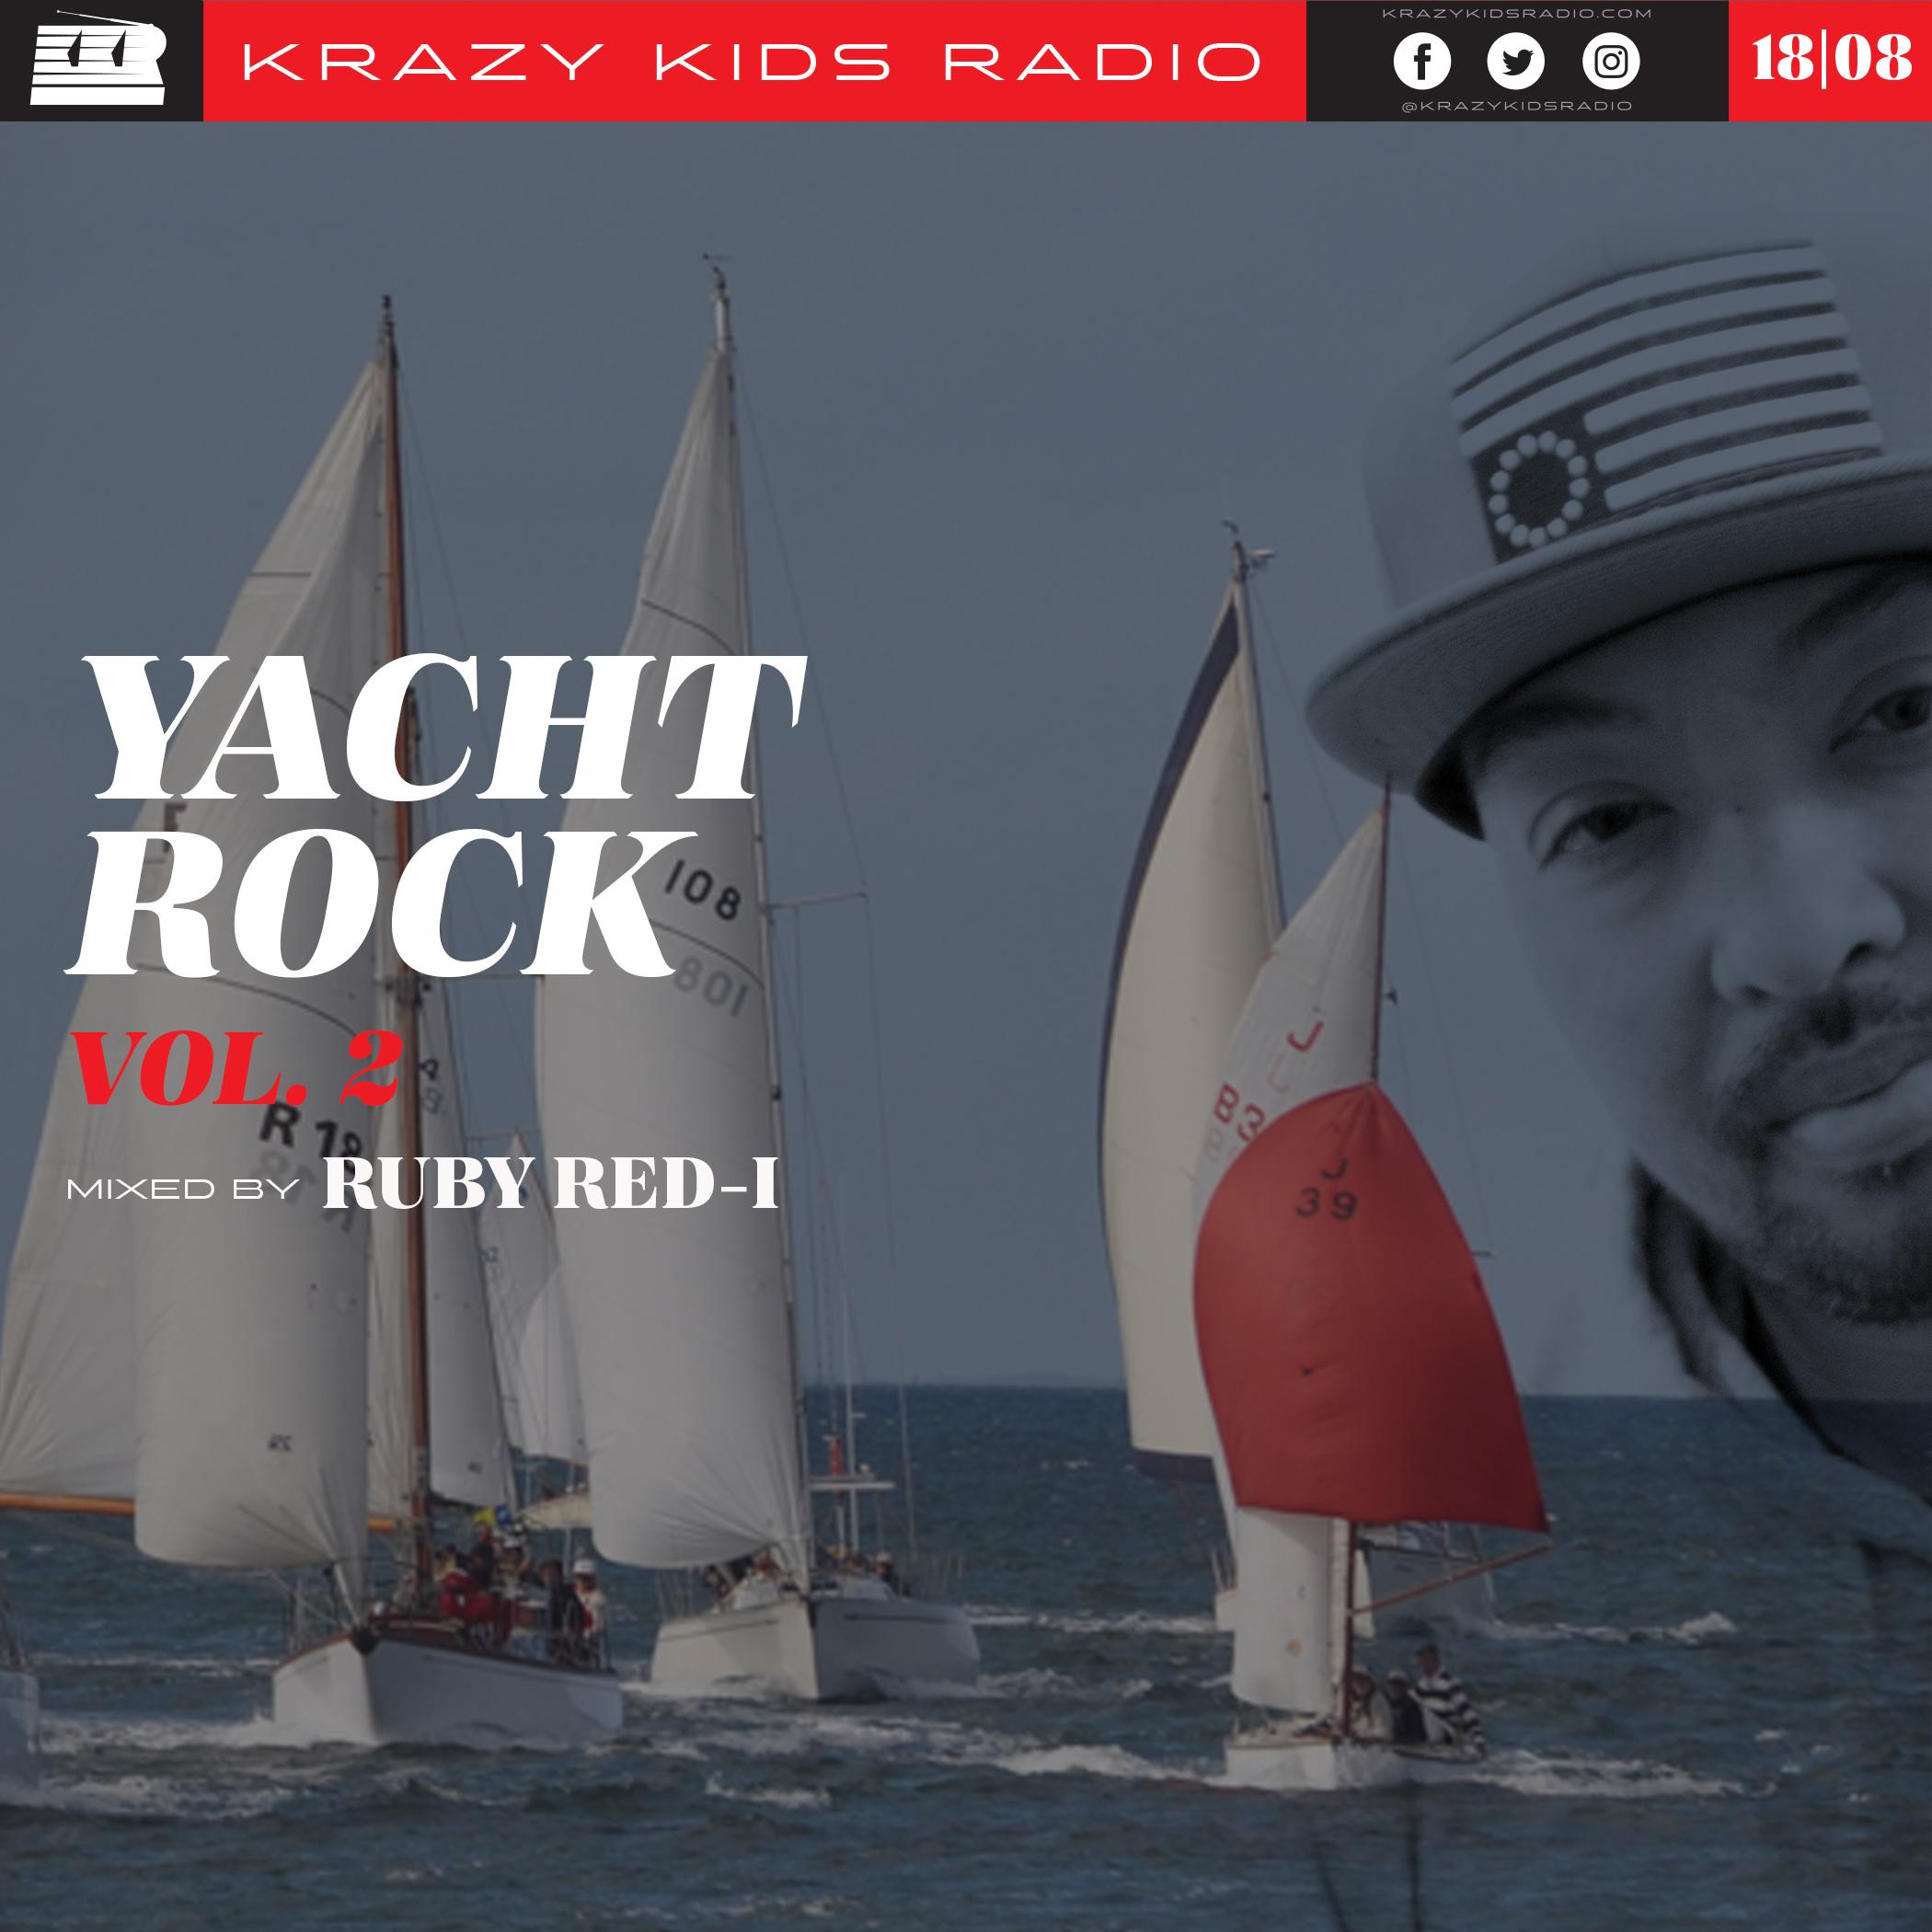 KKR_YACHT-ROCK-VOL-2.jpg